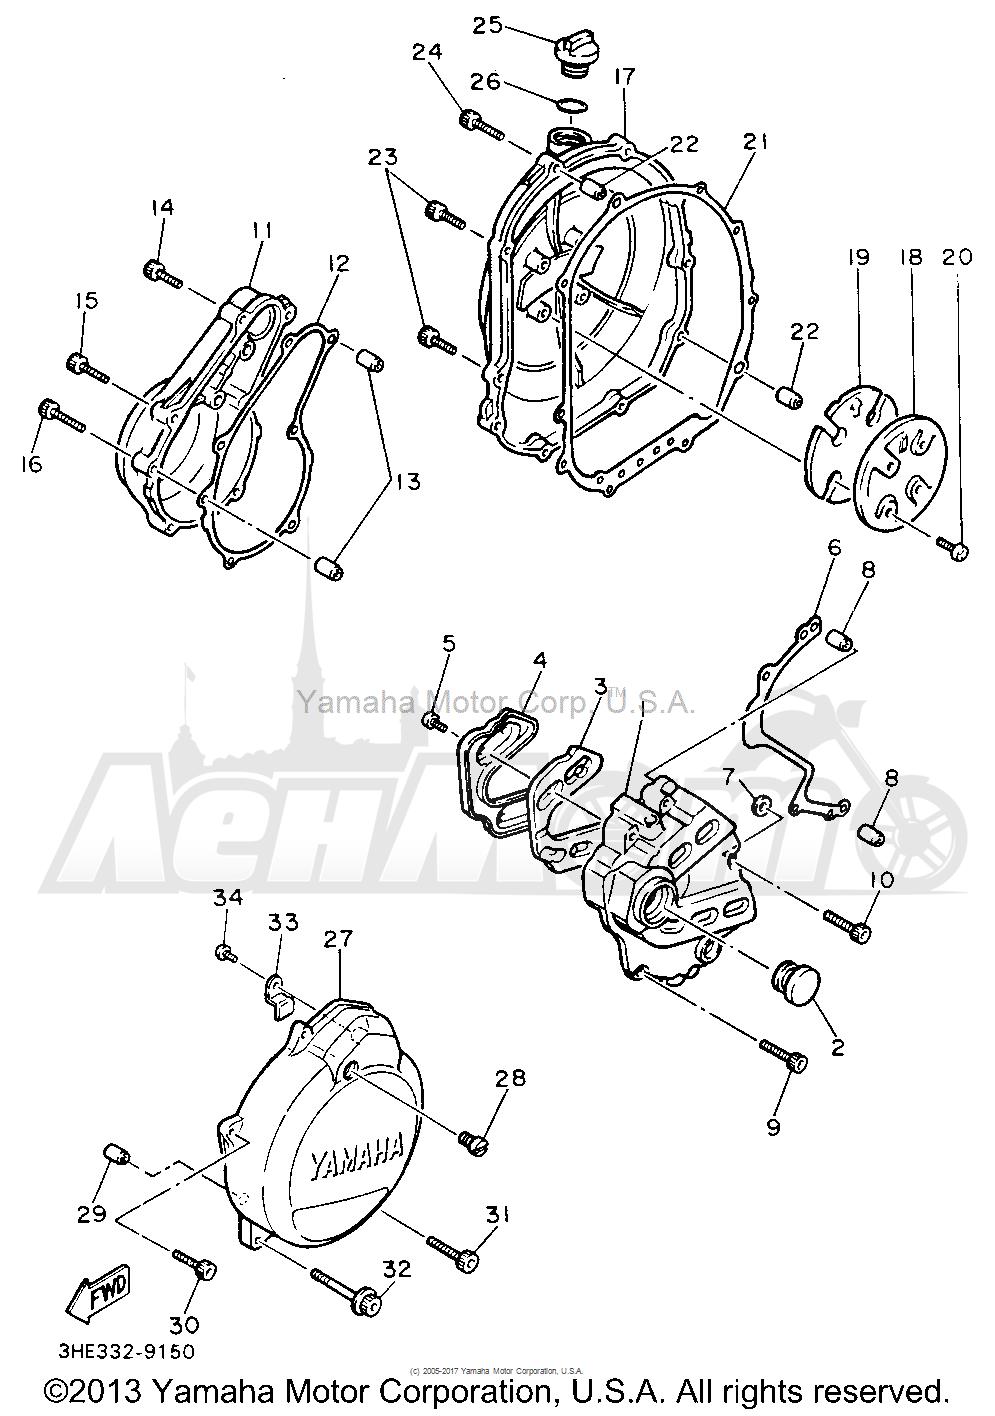 Запчасти для Мотоцикла Yamaha 1991 FZR600RBC Раздел: CRANKCASE COVER 1 | крышка картера 1